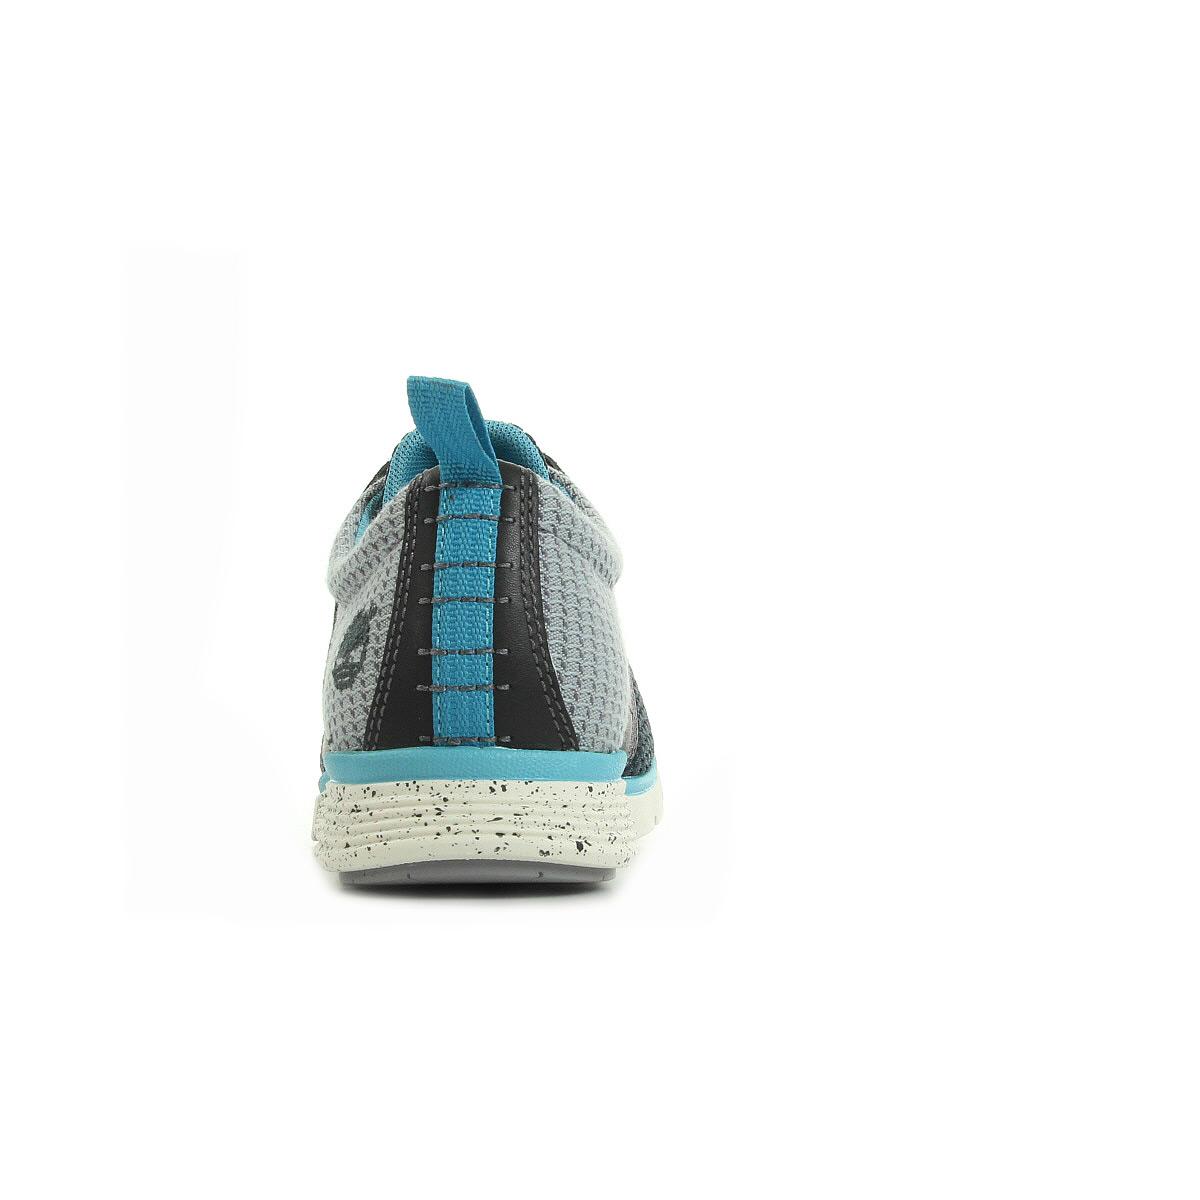 Timberland Killington Baskets Femme Oxford Ca17bh Mode rrvqnxdtwX